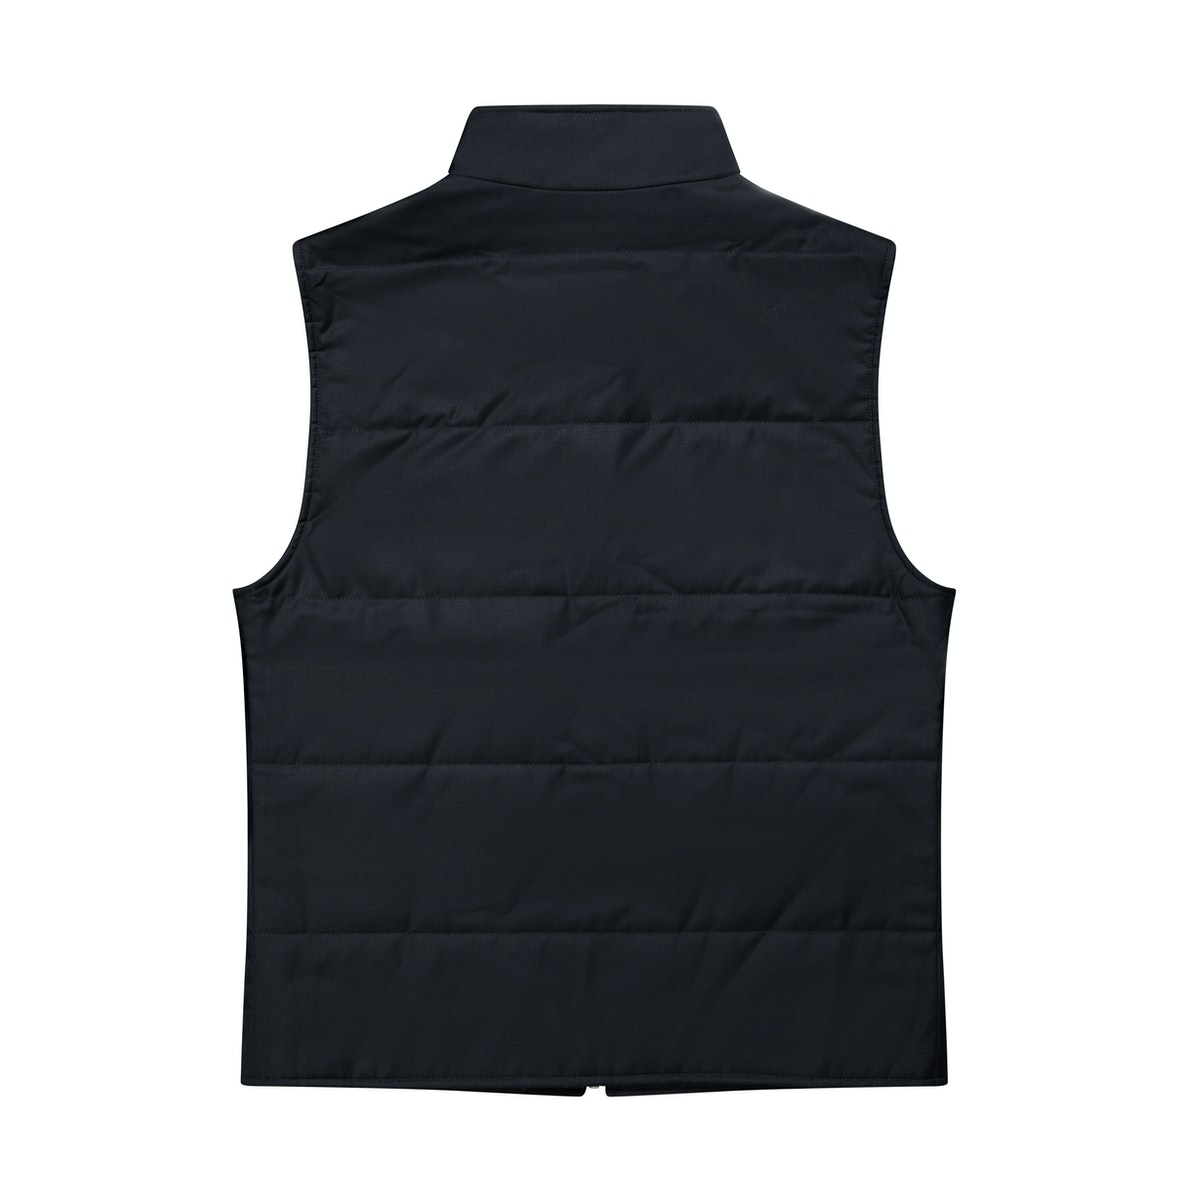 The Watergate Reversible Black Vest